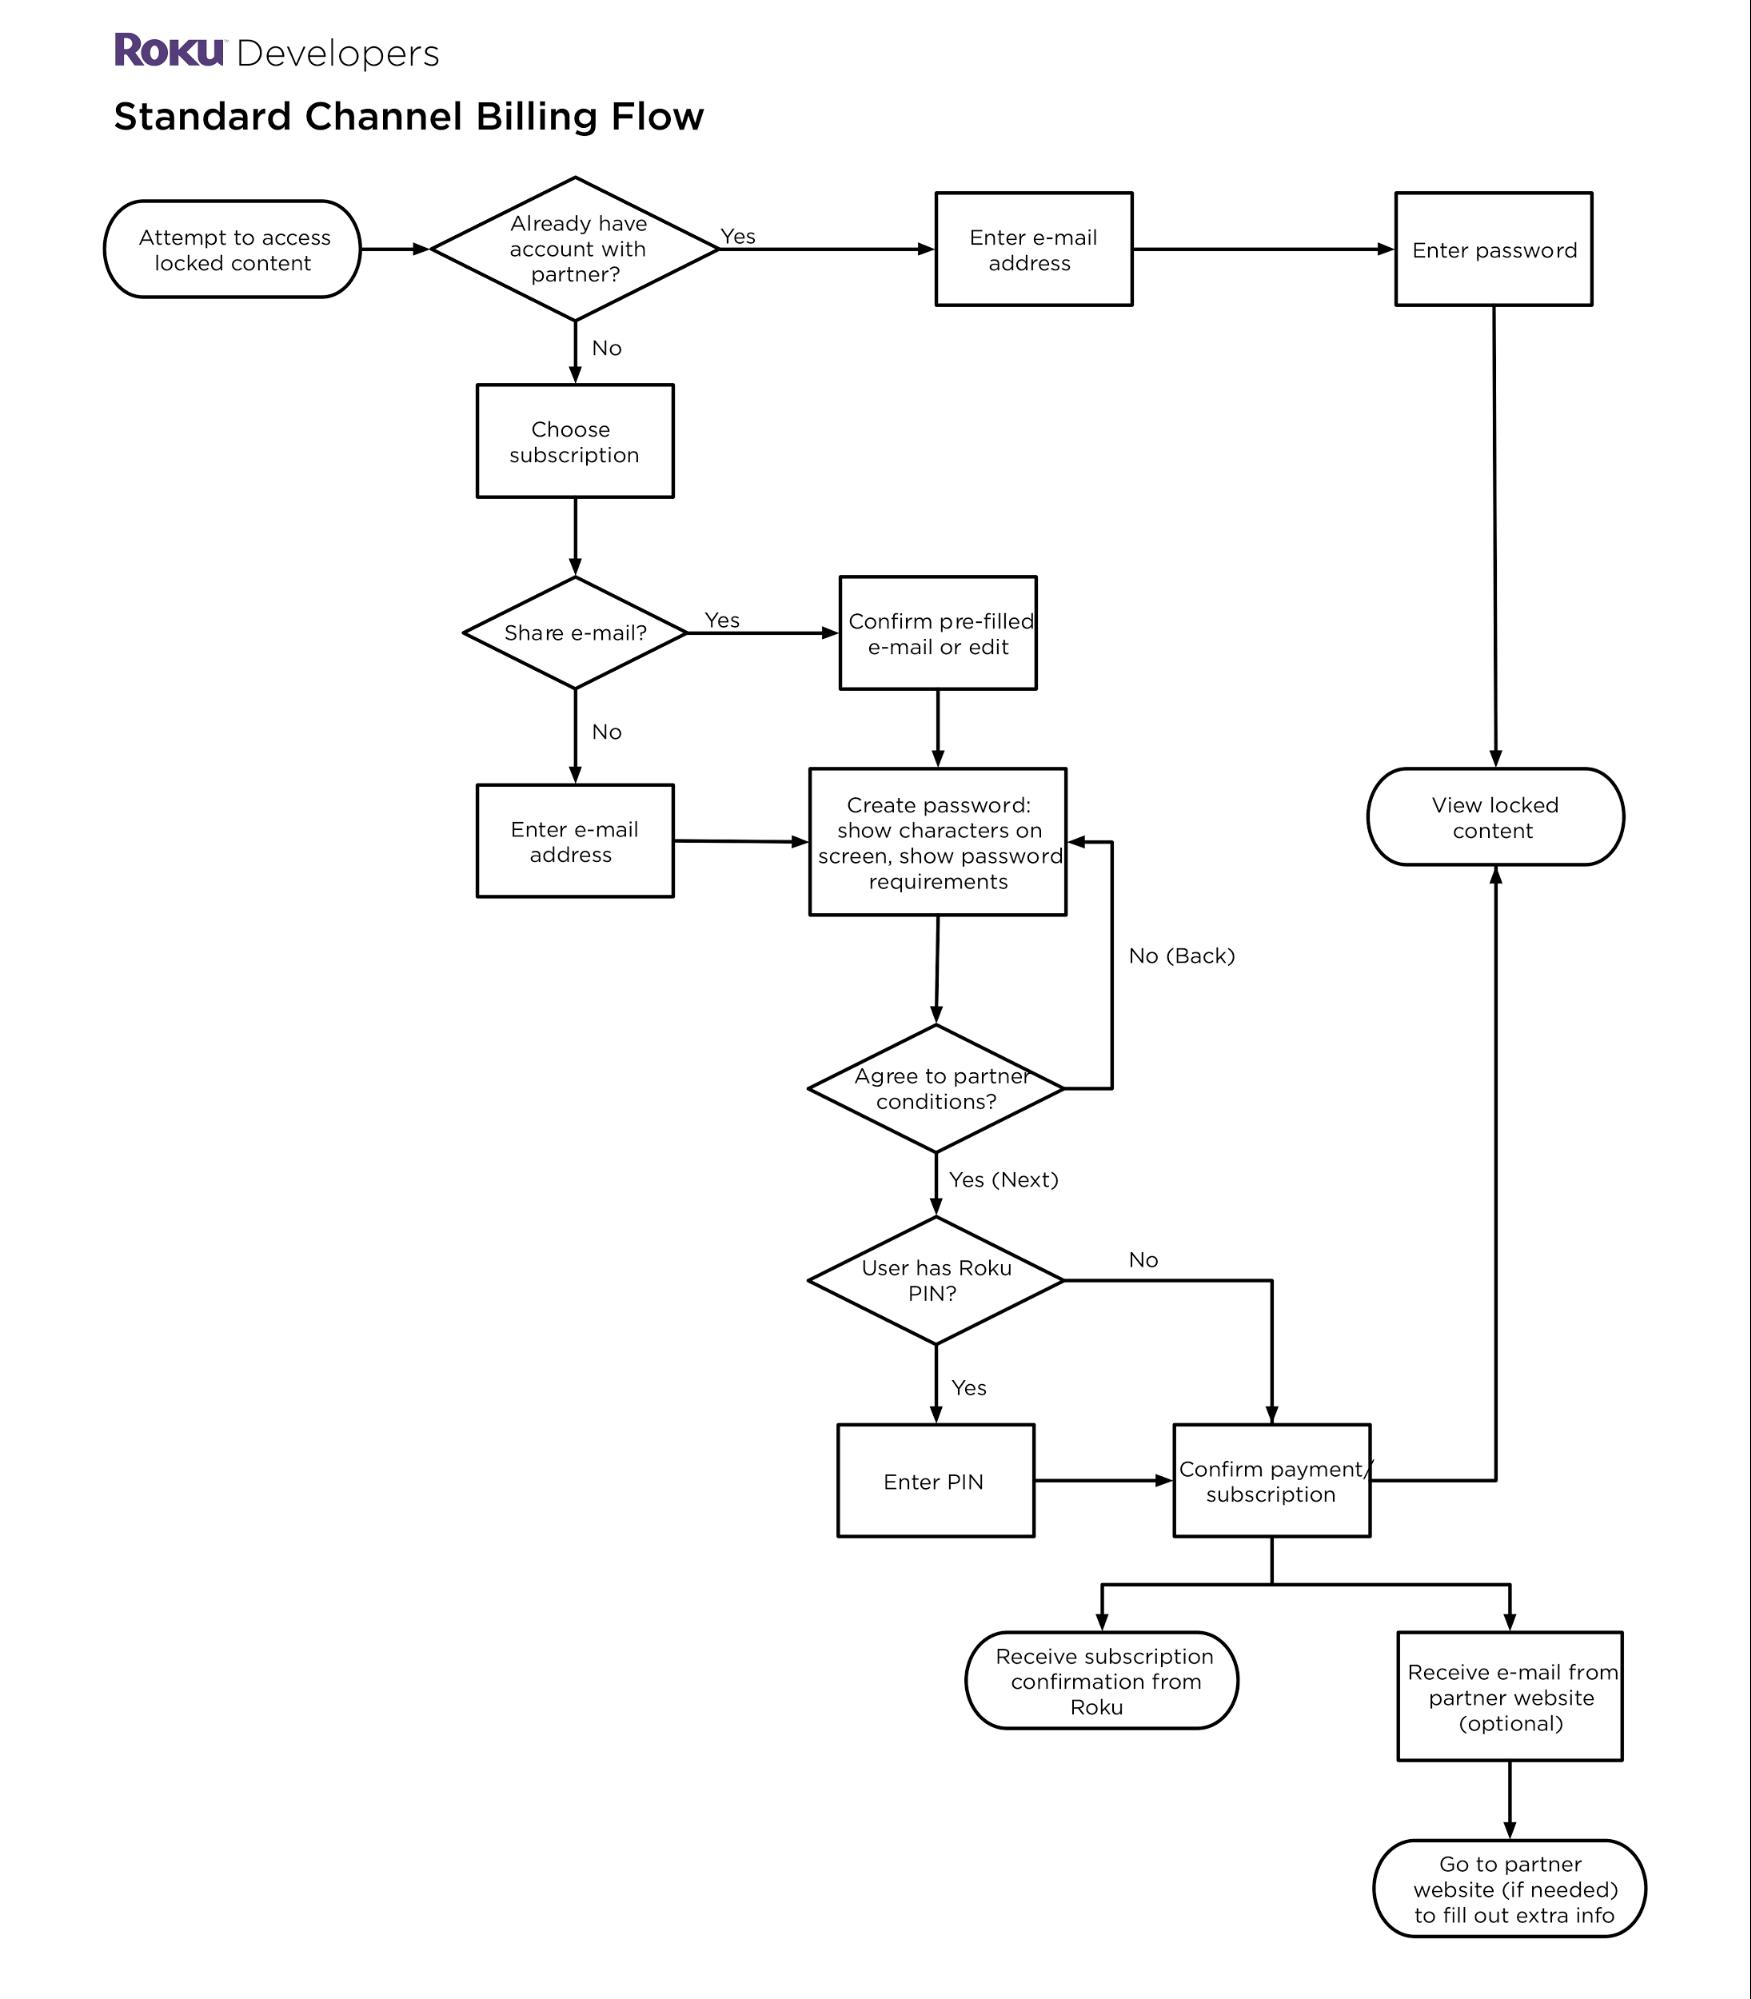 Roku Channel Bank Wiring Diagram Standard Billing Flow